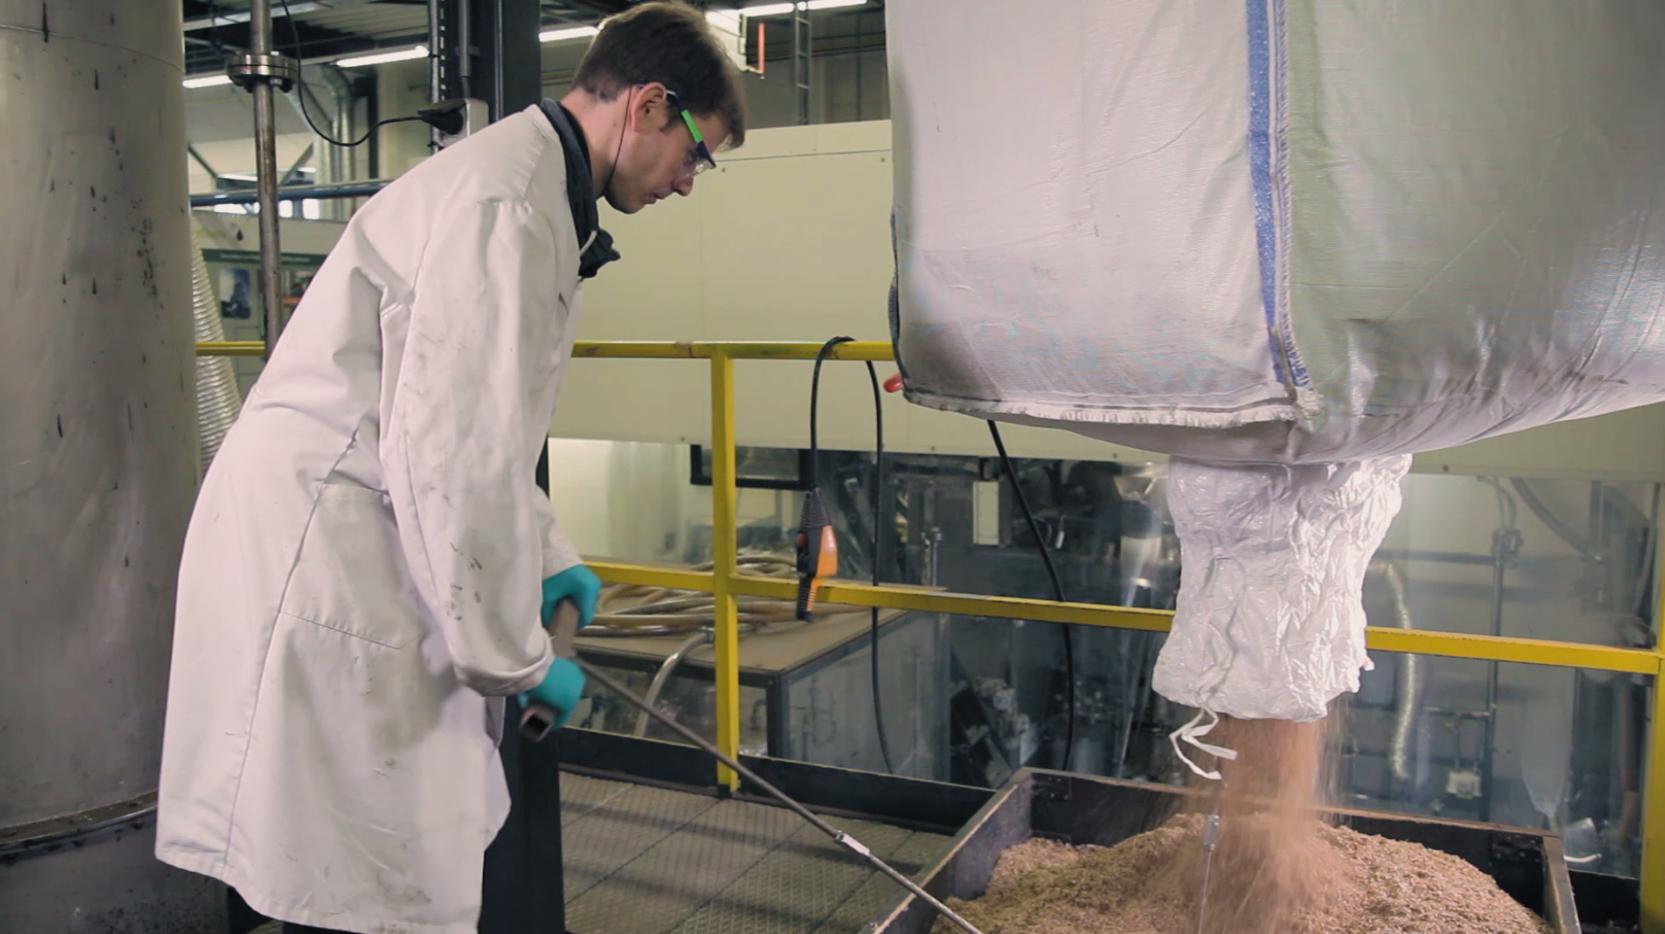 Green jobs in the innovative bioeconomy